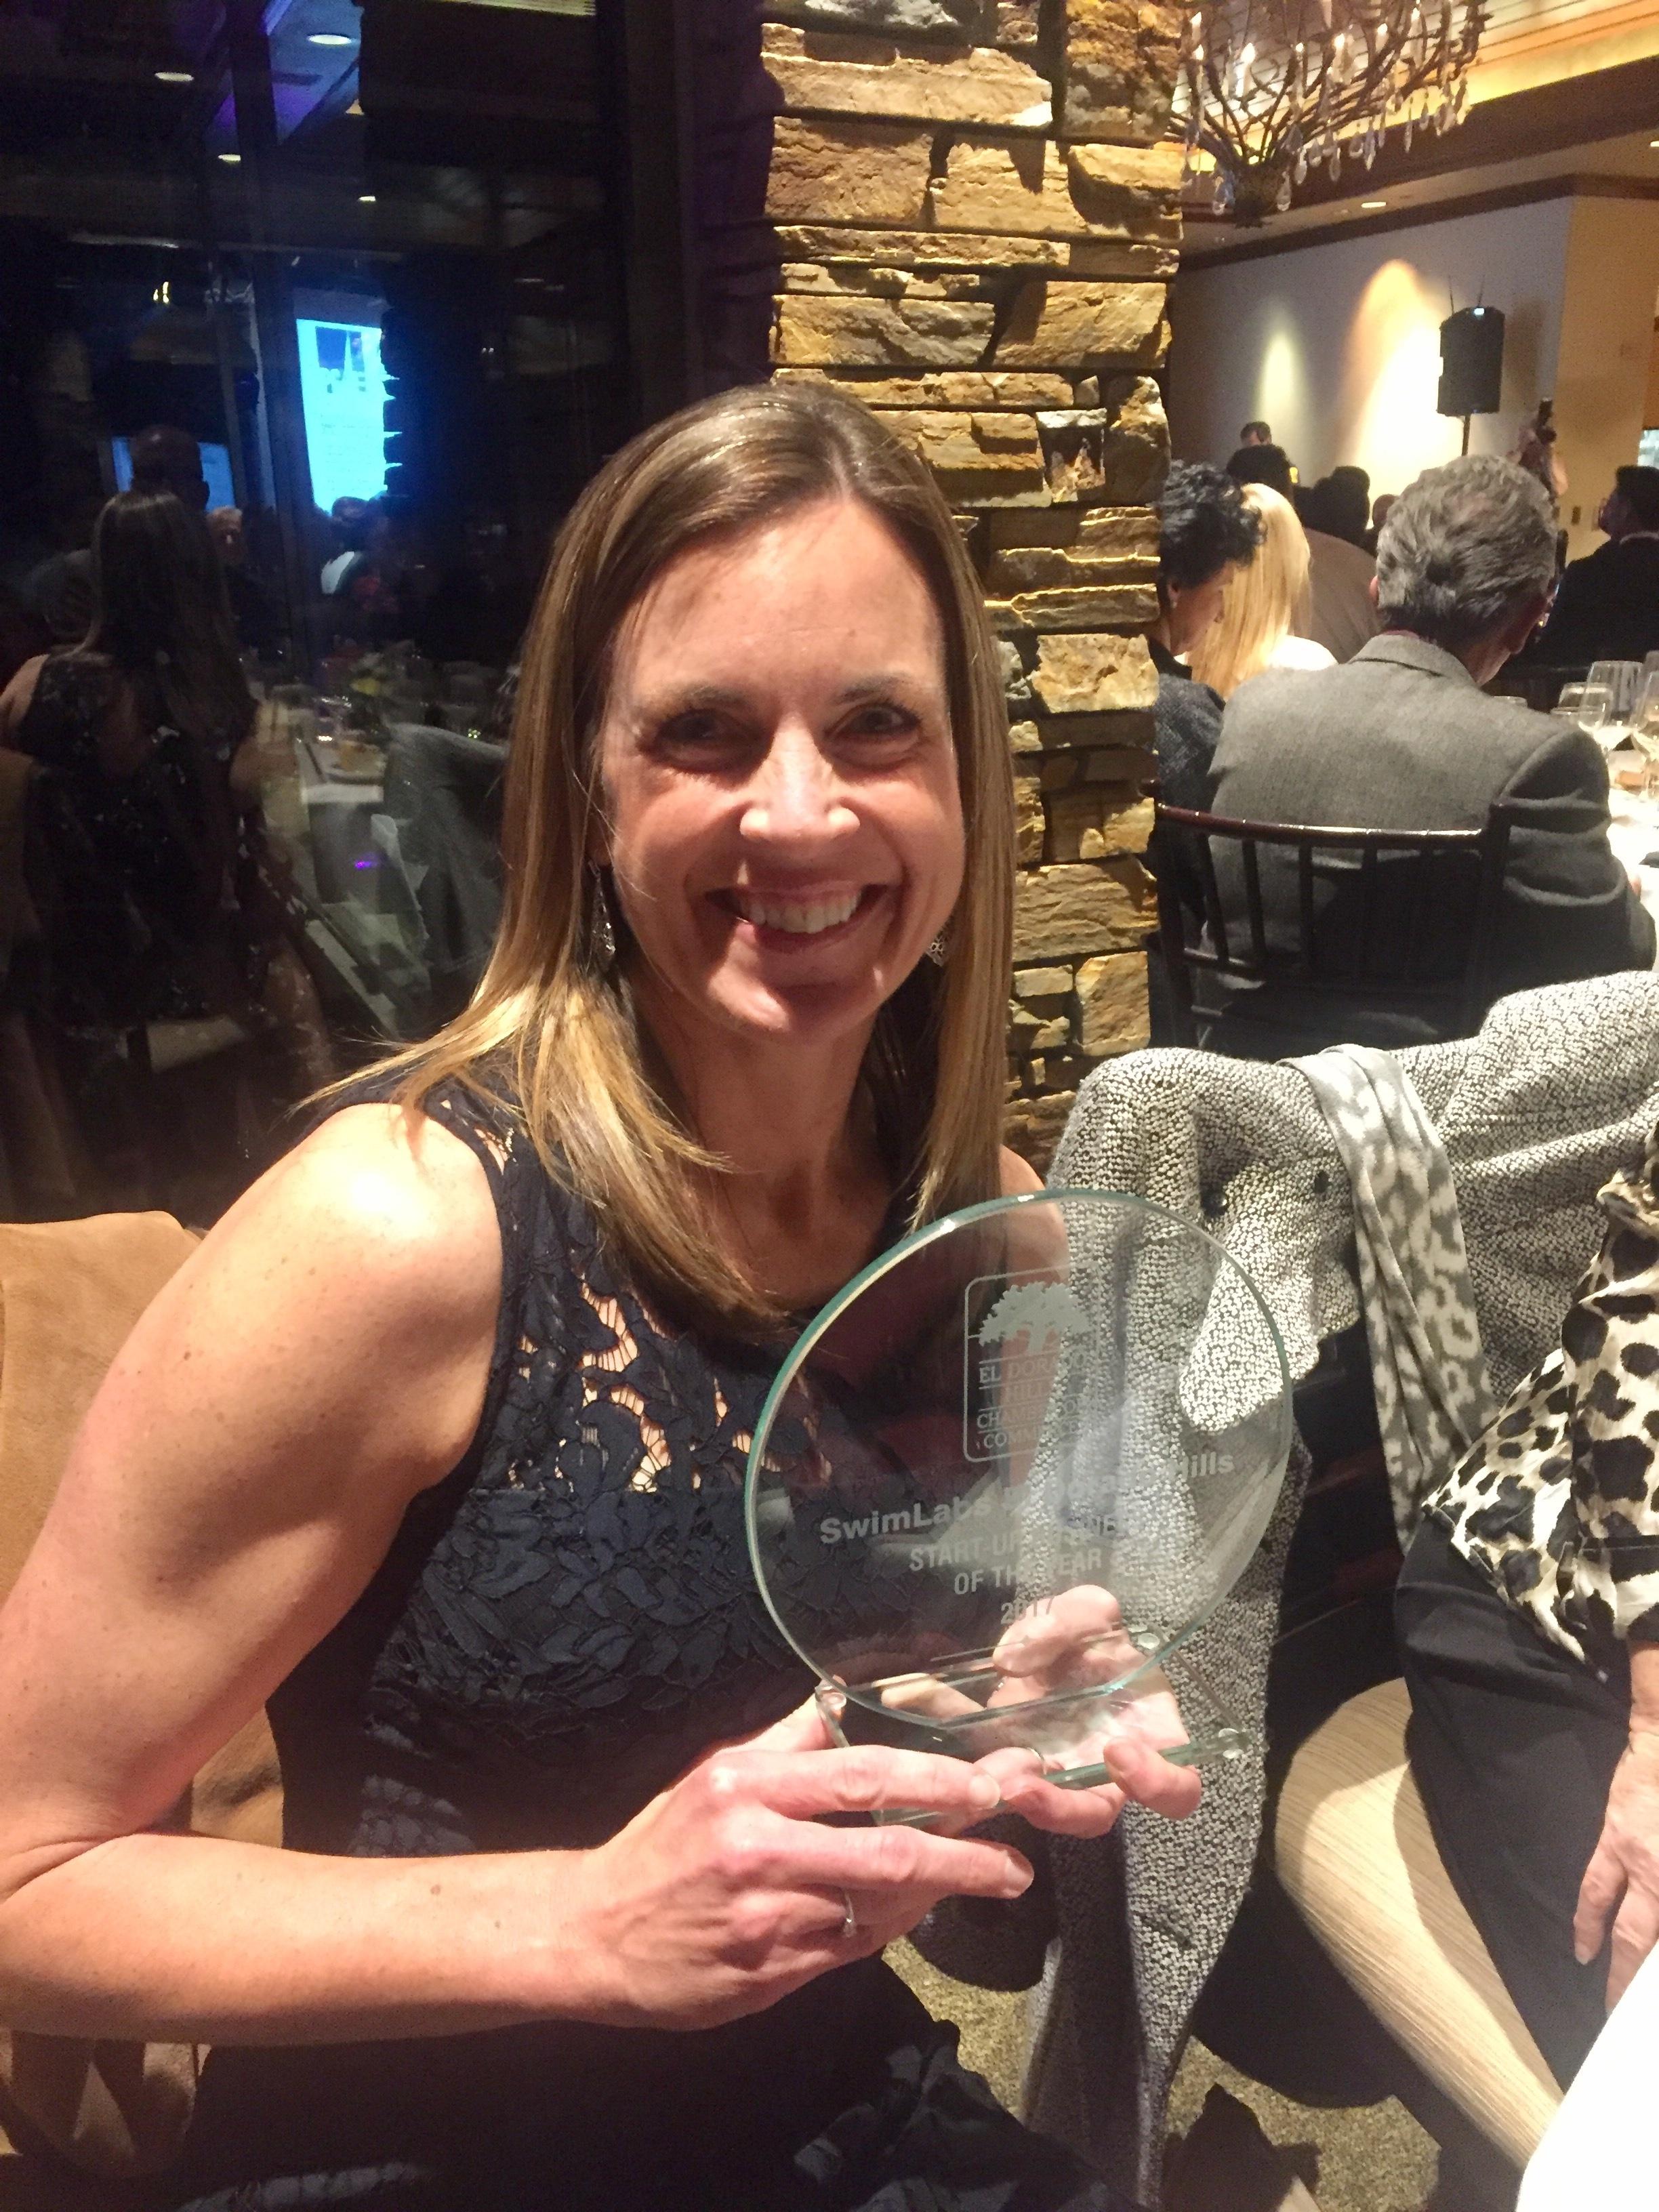 SwimLabs El Dorado Wins Start-Up Business of the Year!